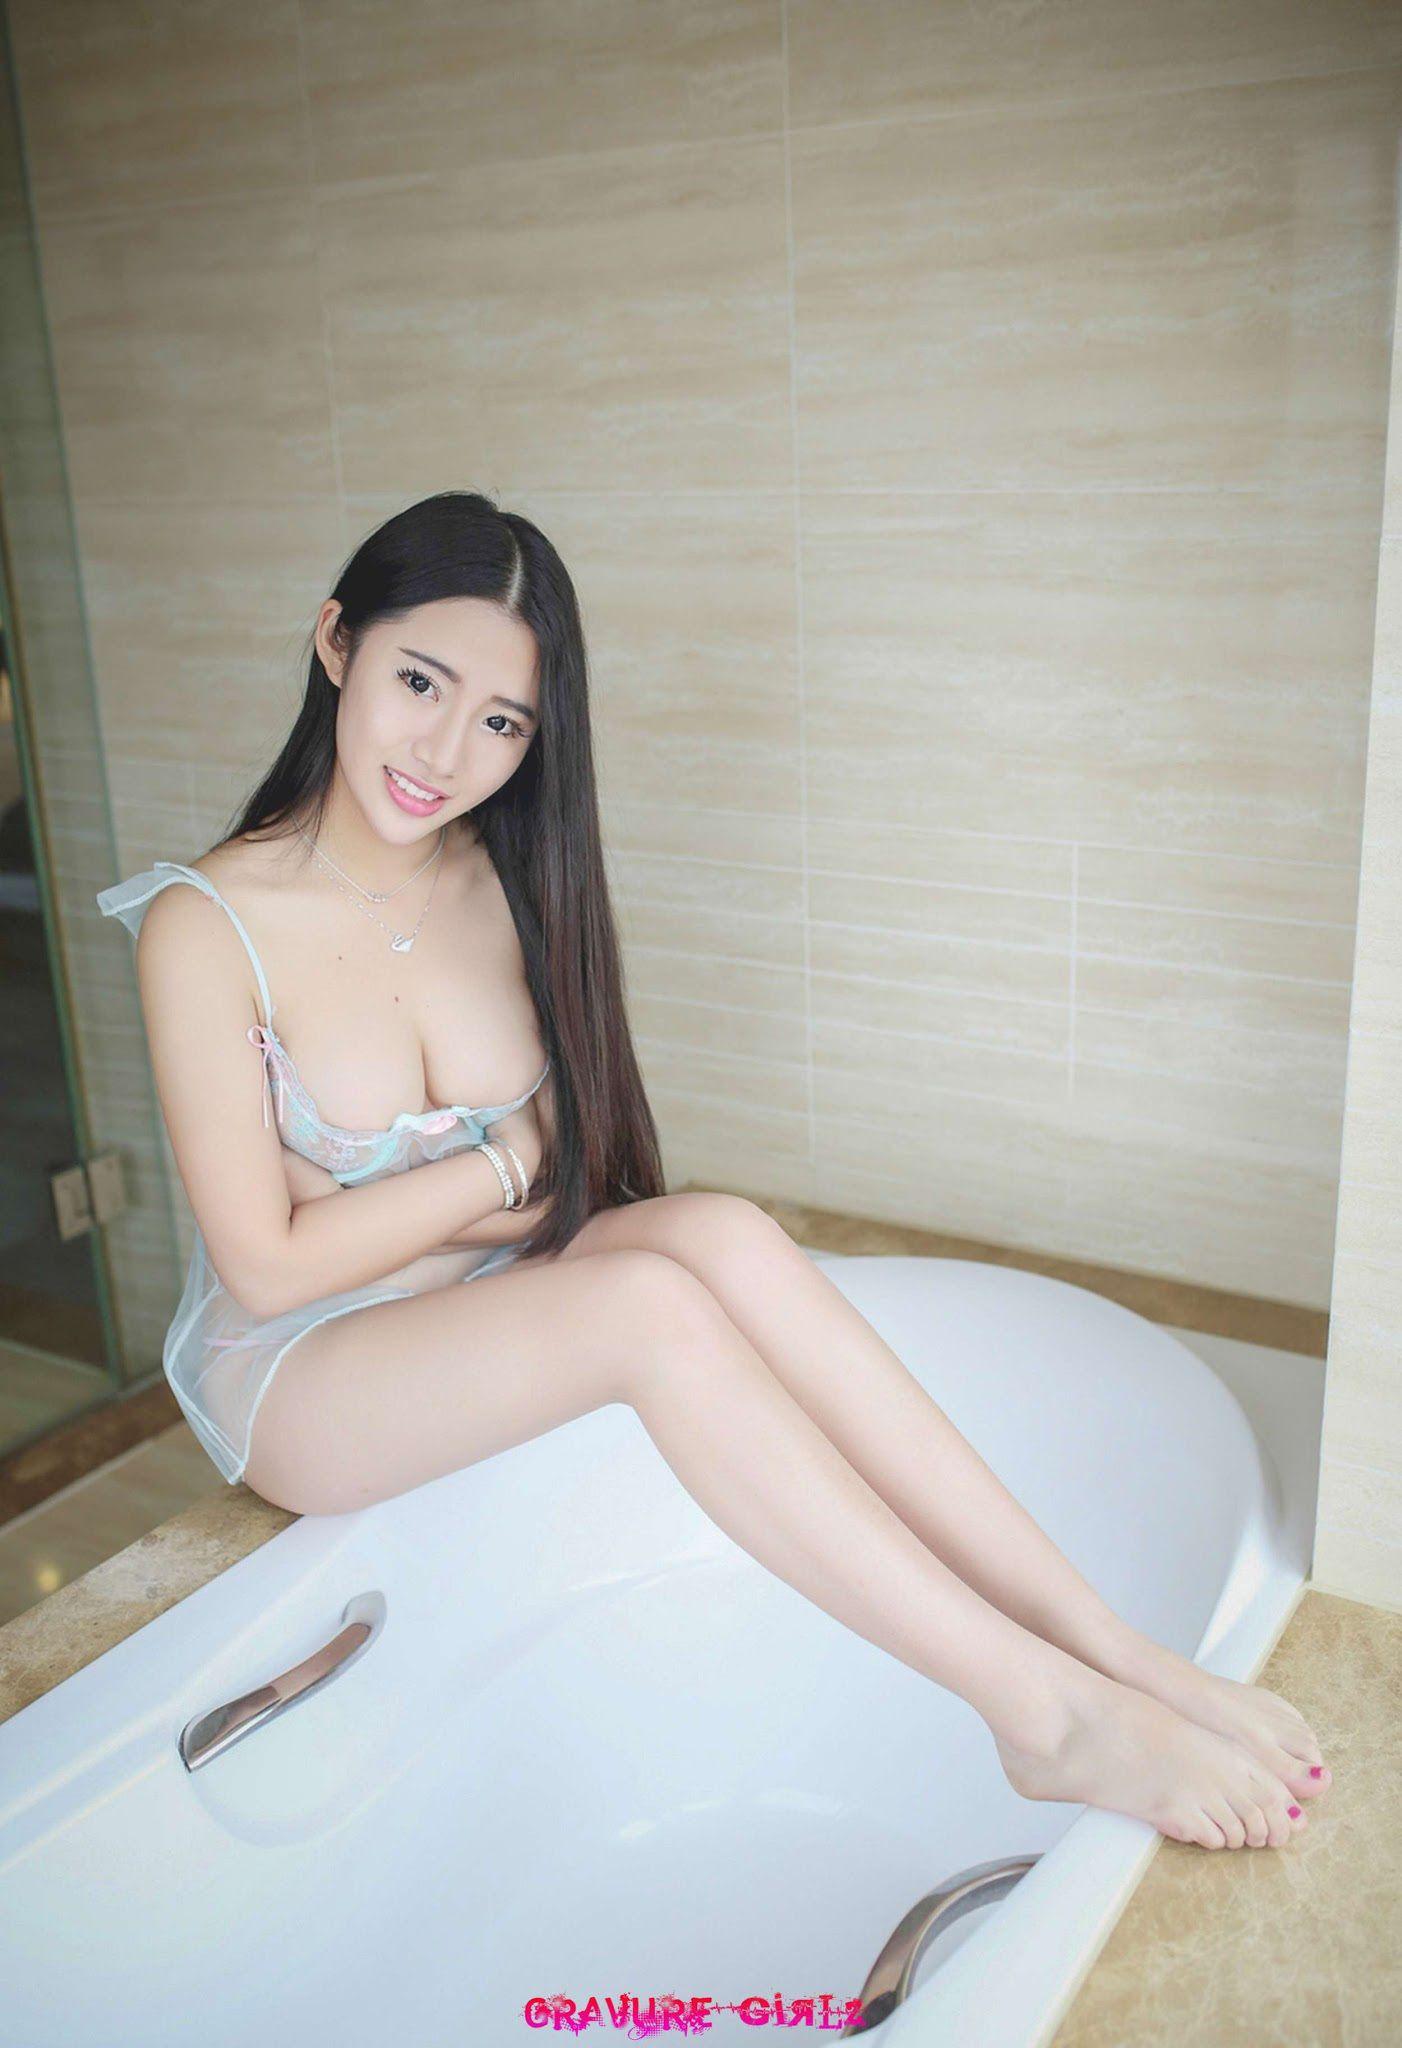 E E Tiffany Uncensored See Through E A E Ba Ba E Bd Xiuren Xrn Gravuregirls Hot Photo